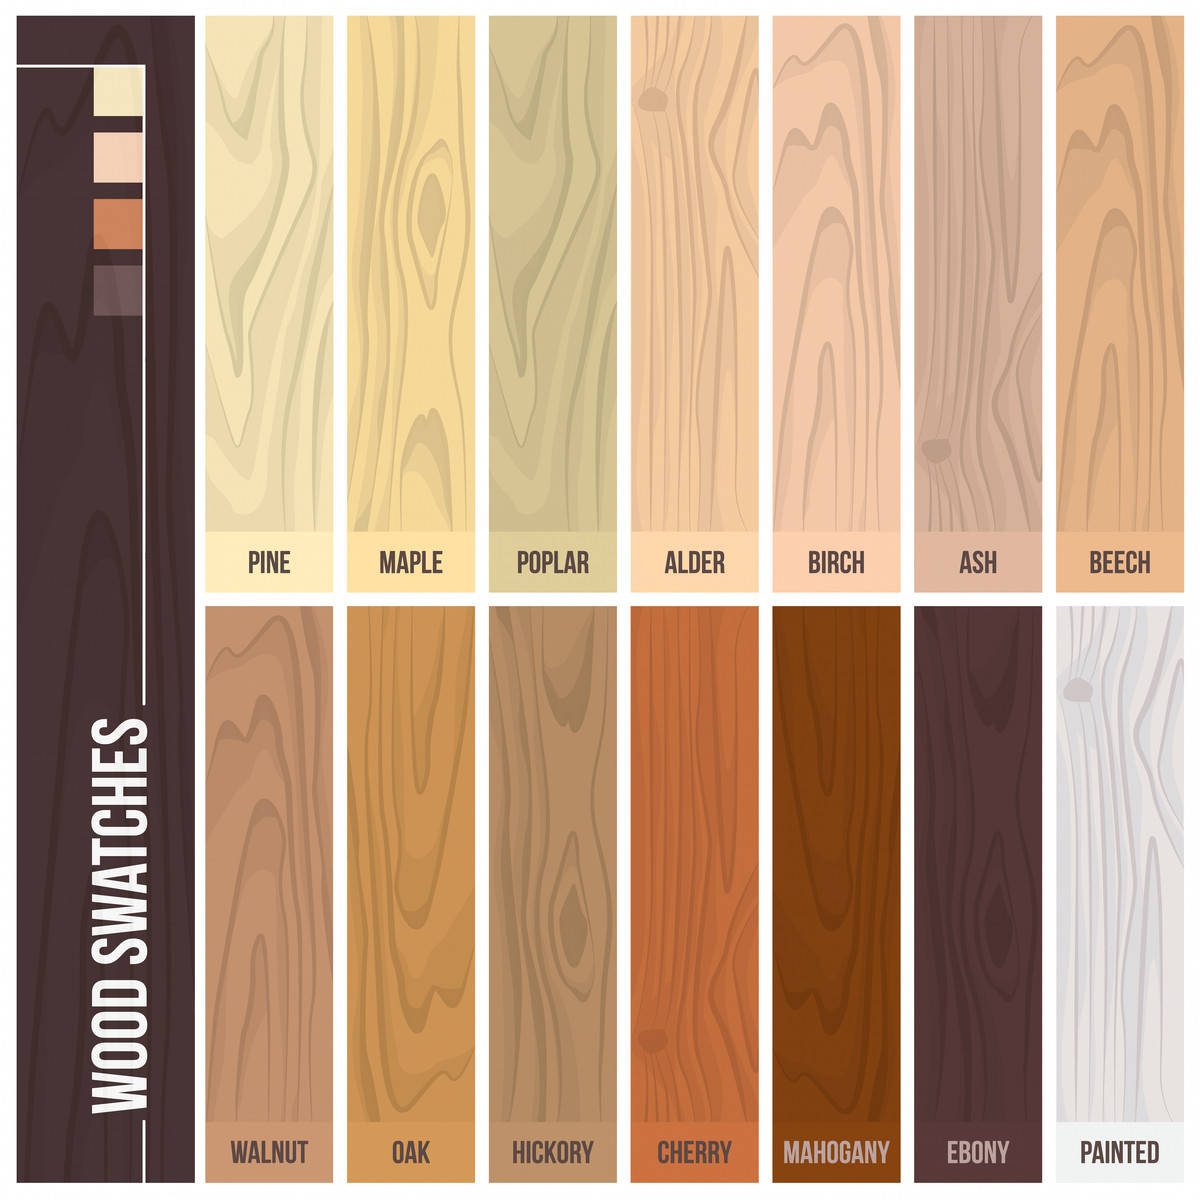 best hardwood floor mop 2016 of 12 types of hardwood flooring species styles edging dimensions in types of hardwood flooring illustrated guide